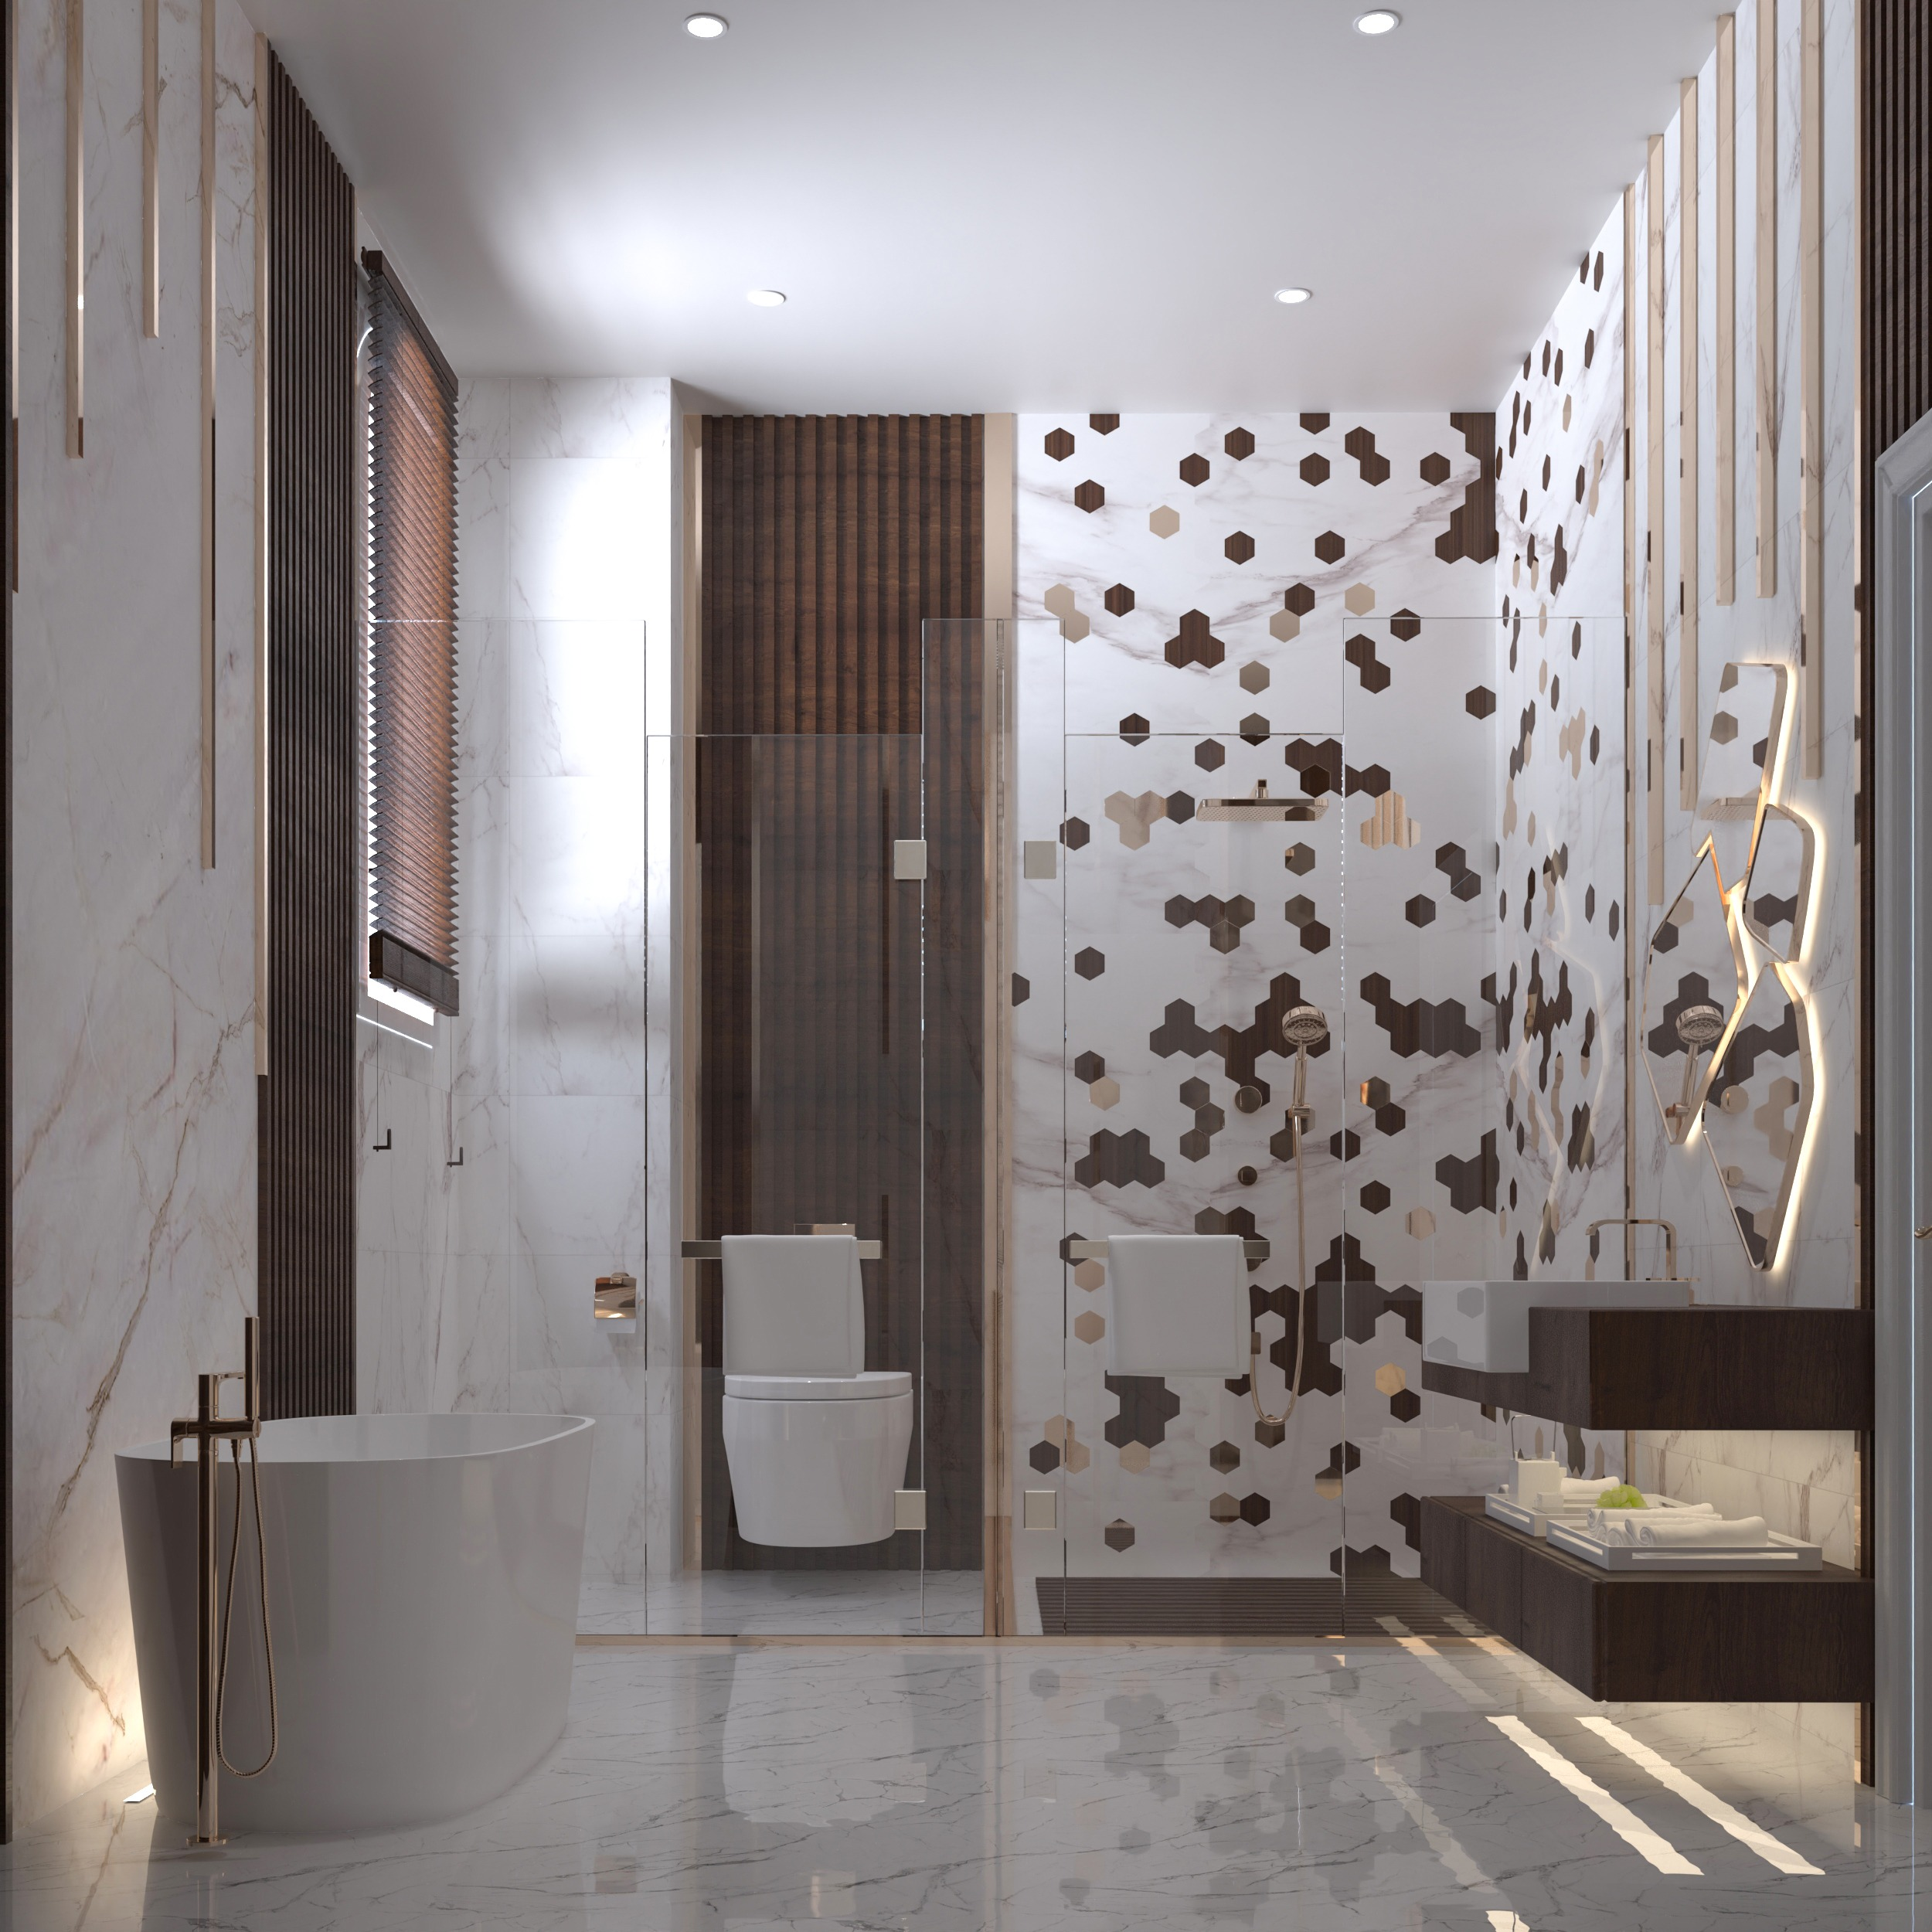 CNC - WELL DESIGNED BATHROOMS